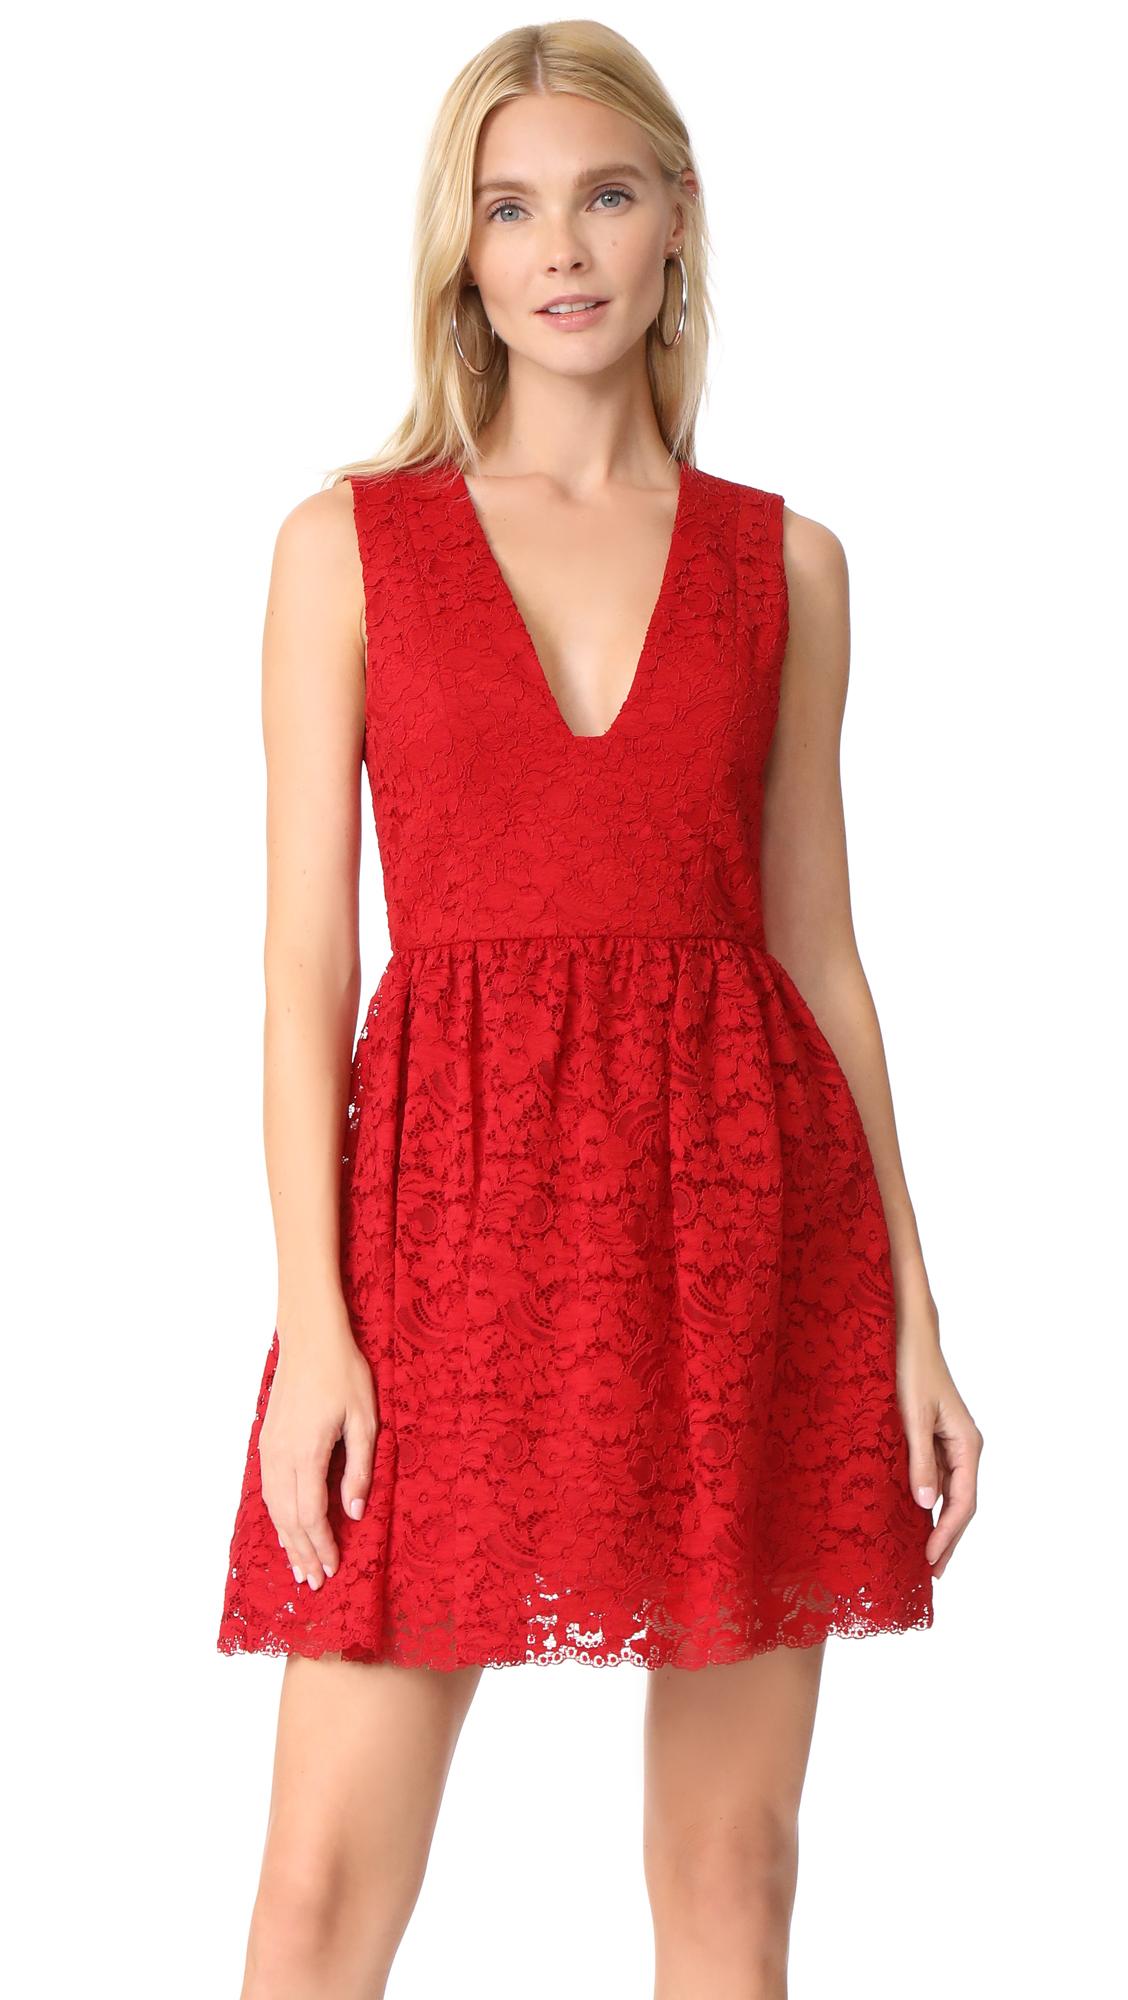 alice + olivia Kappa Party Dress - Deep Ruby